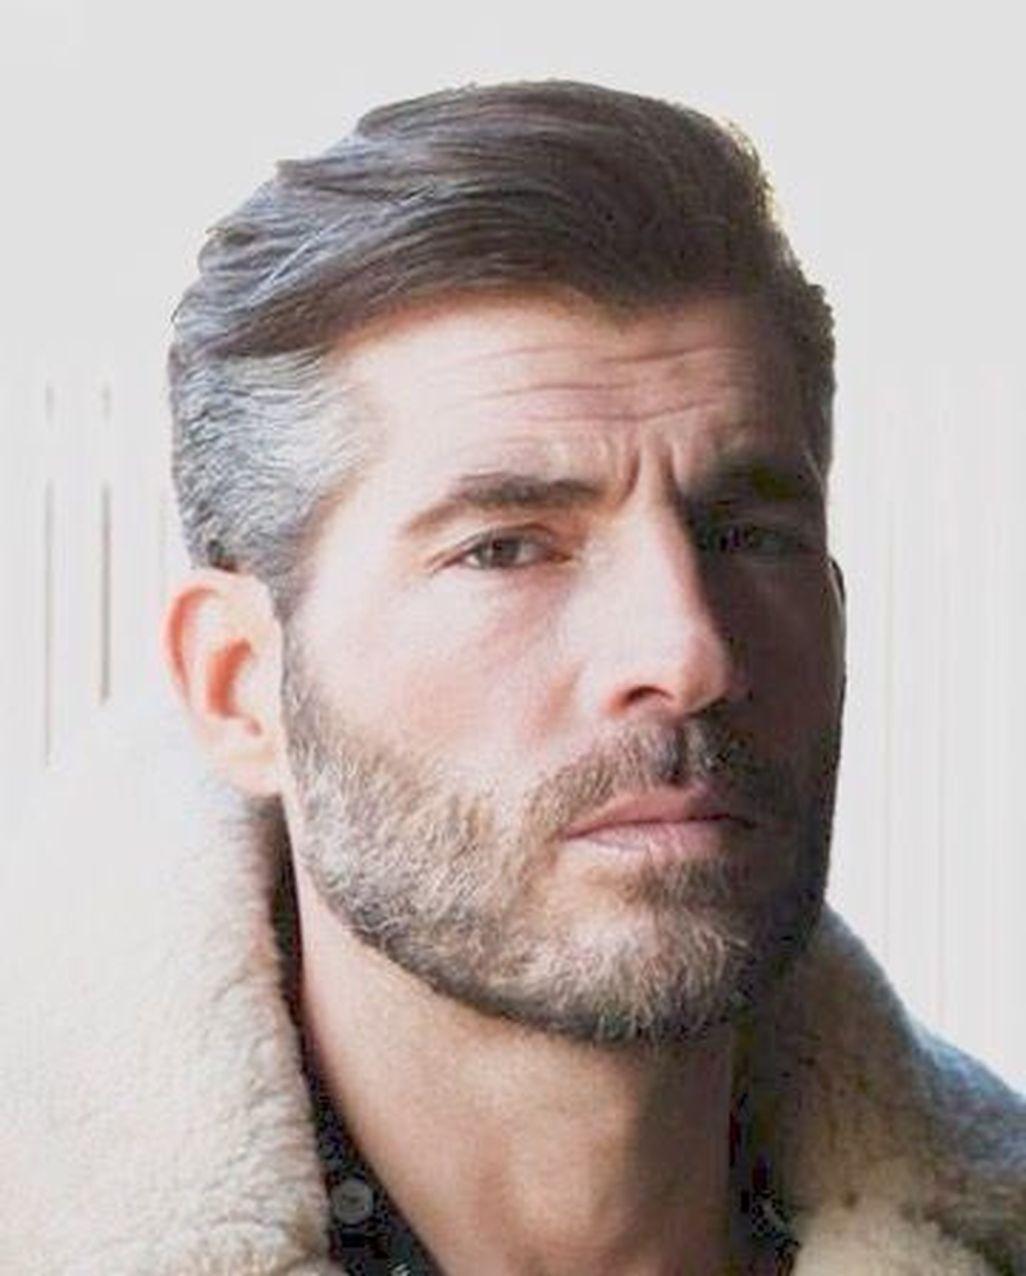 19 Extraordinary Hairstyles For Medium Length Hair Ideas Older Mens Hairstyles Beard Styles Short Beard Styles For Men